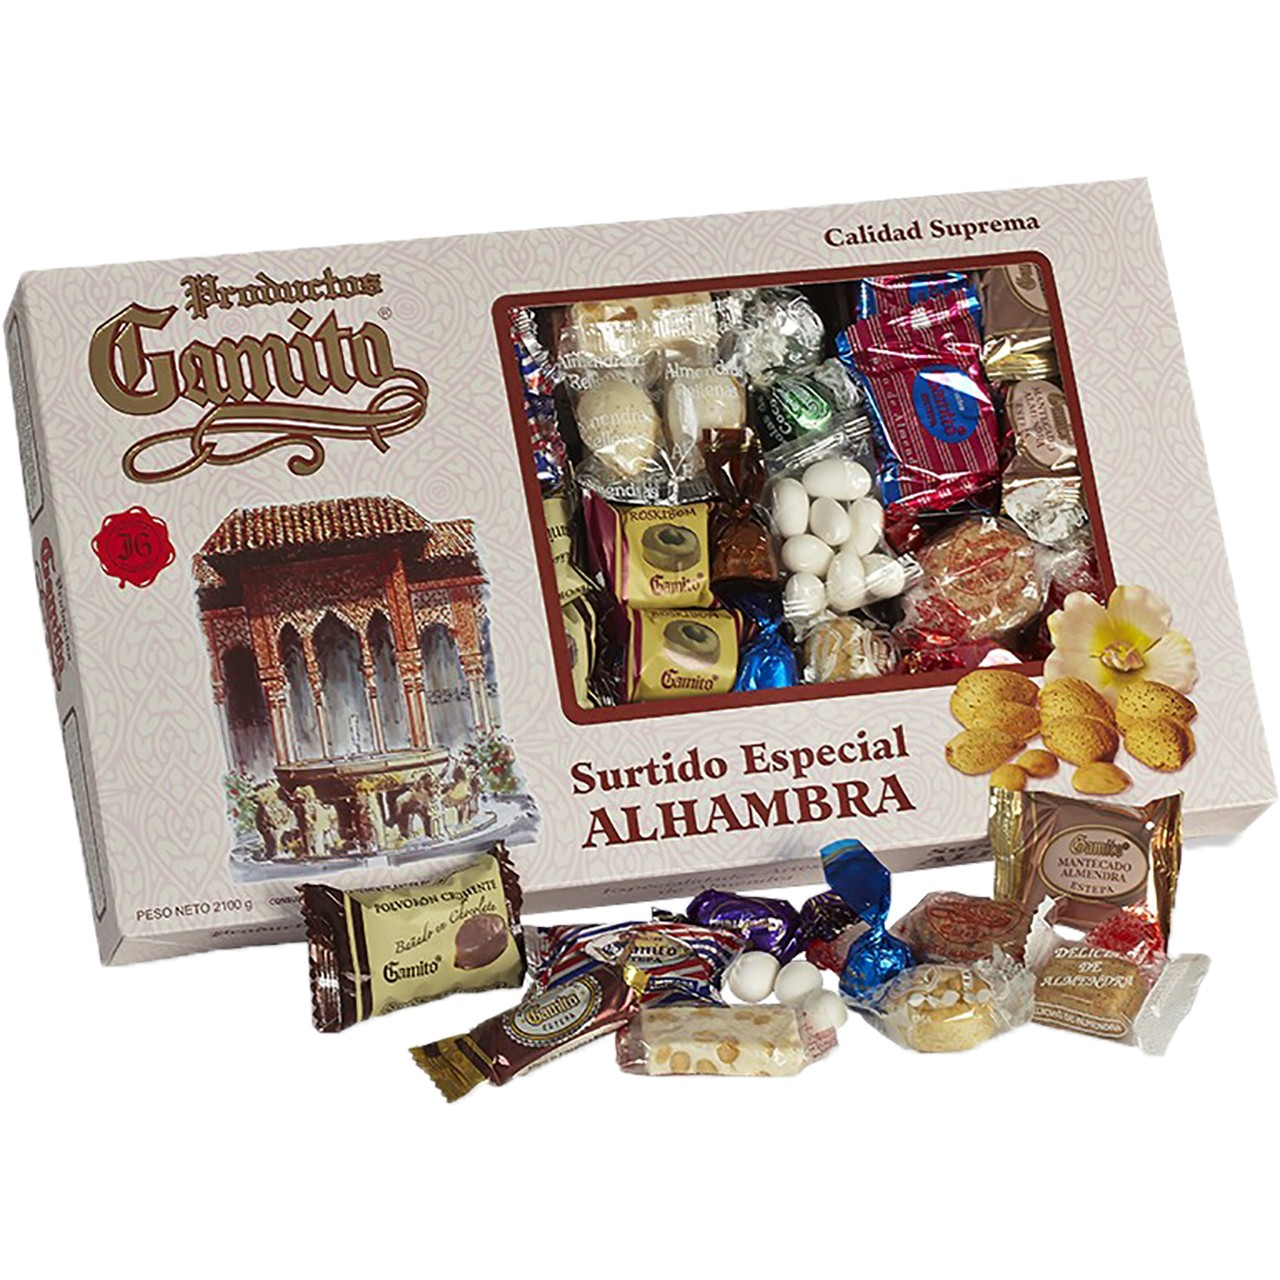 Gebäckmischung Alhambra - Surtido Especial 2,2 Kg